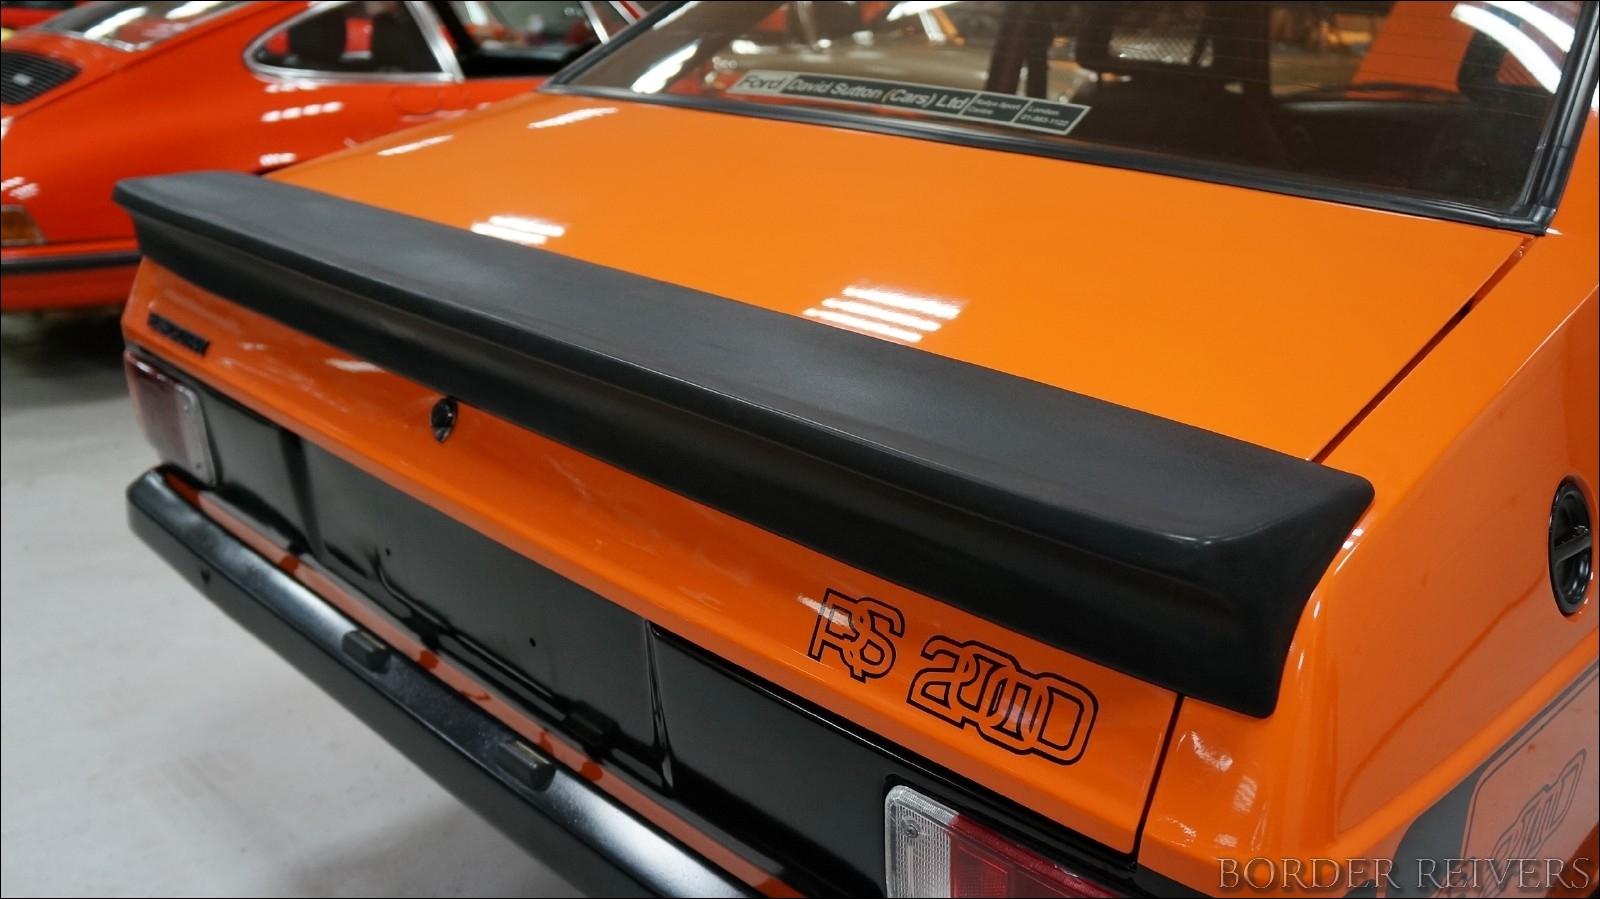 Ford Escort RS2000 1980 - Border ReiversBorder Reivers